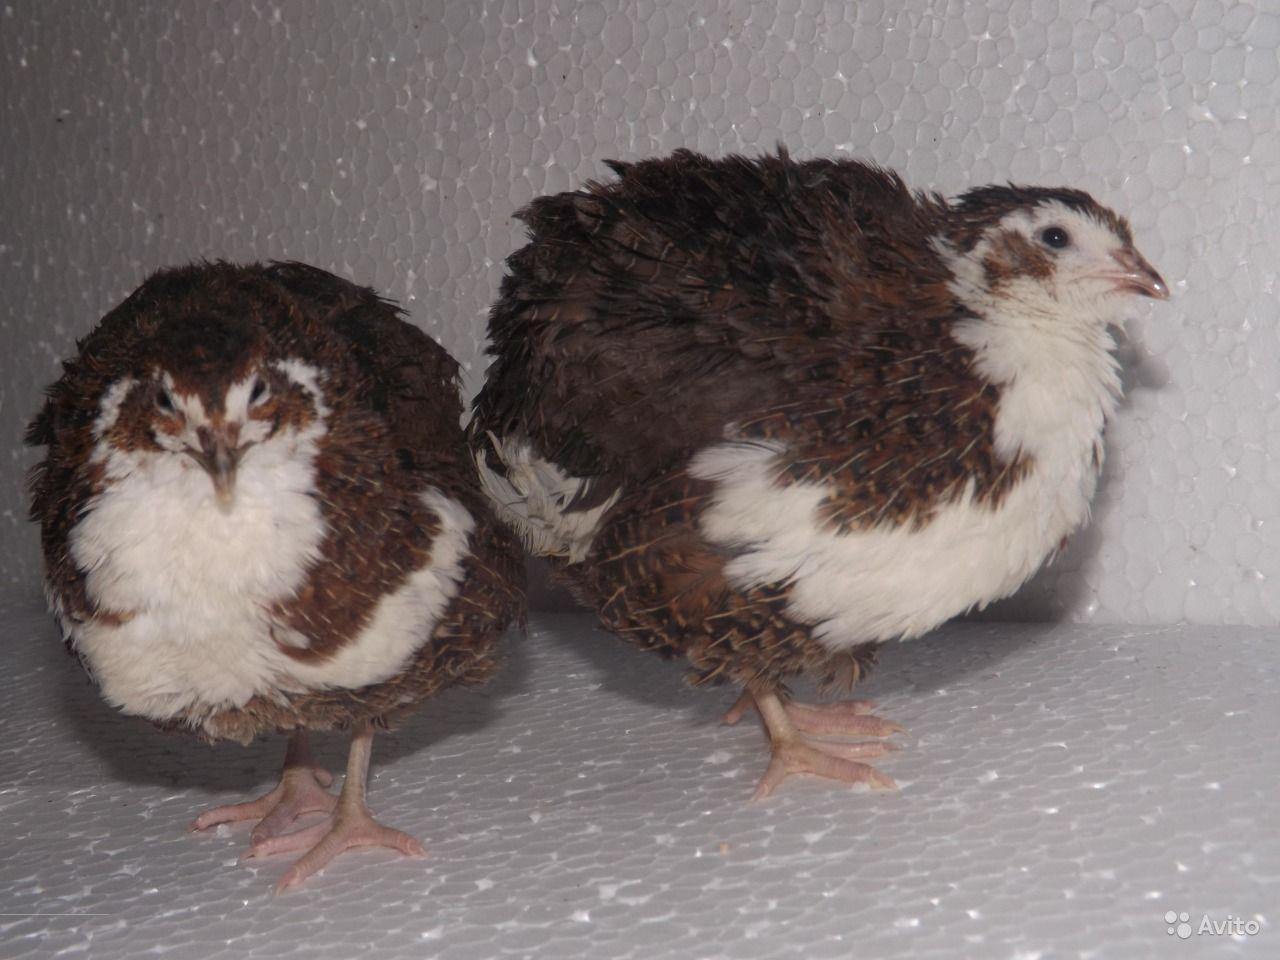 аллергия на перепелов птиц симптомы